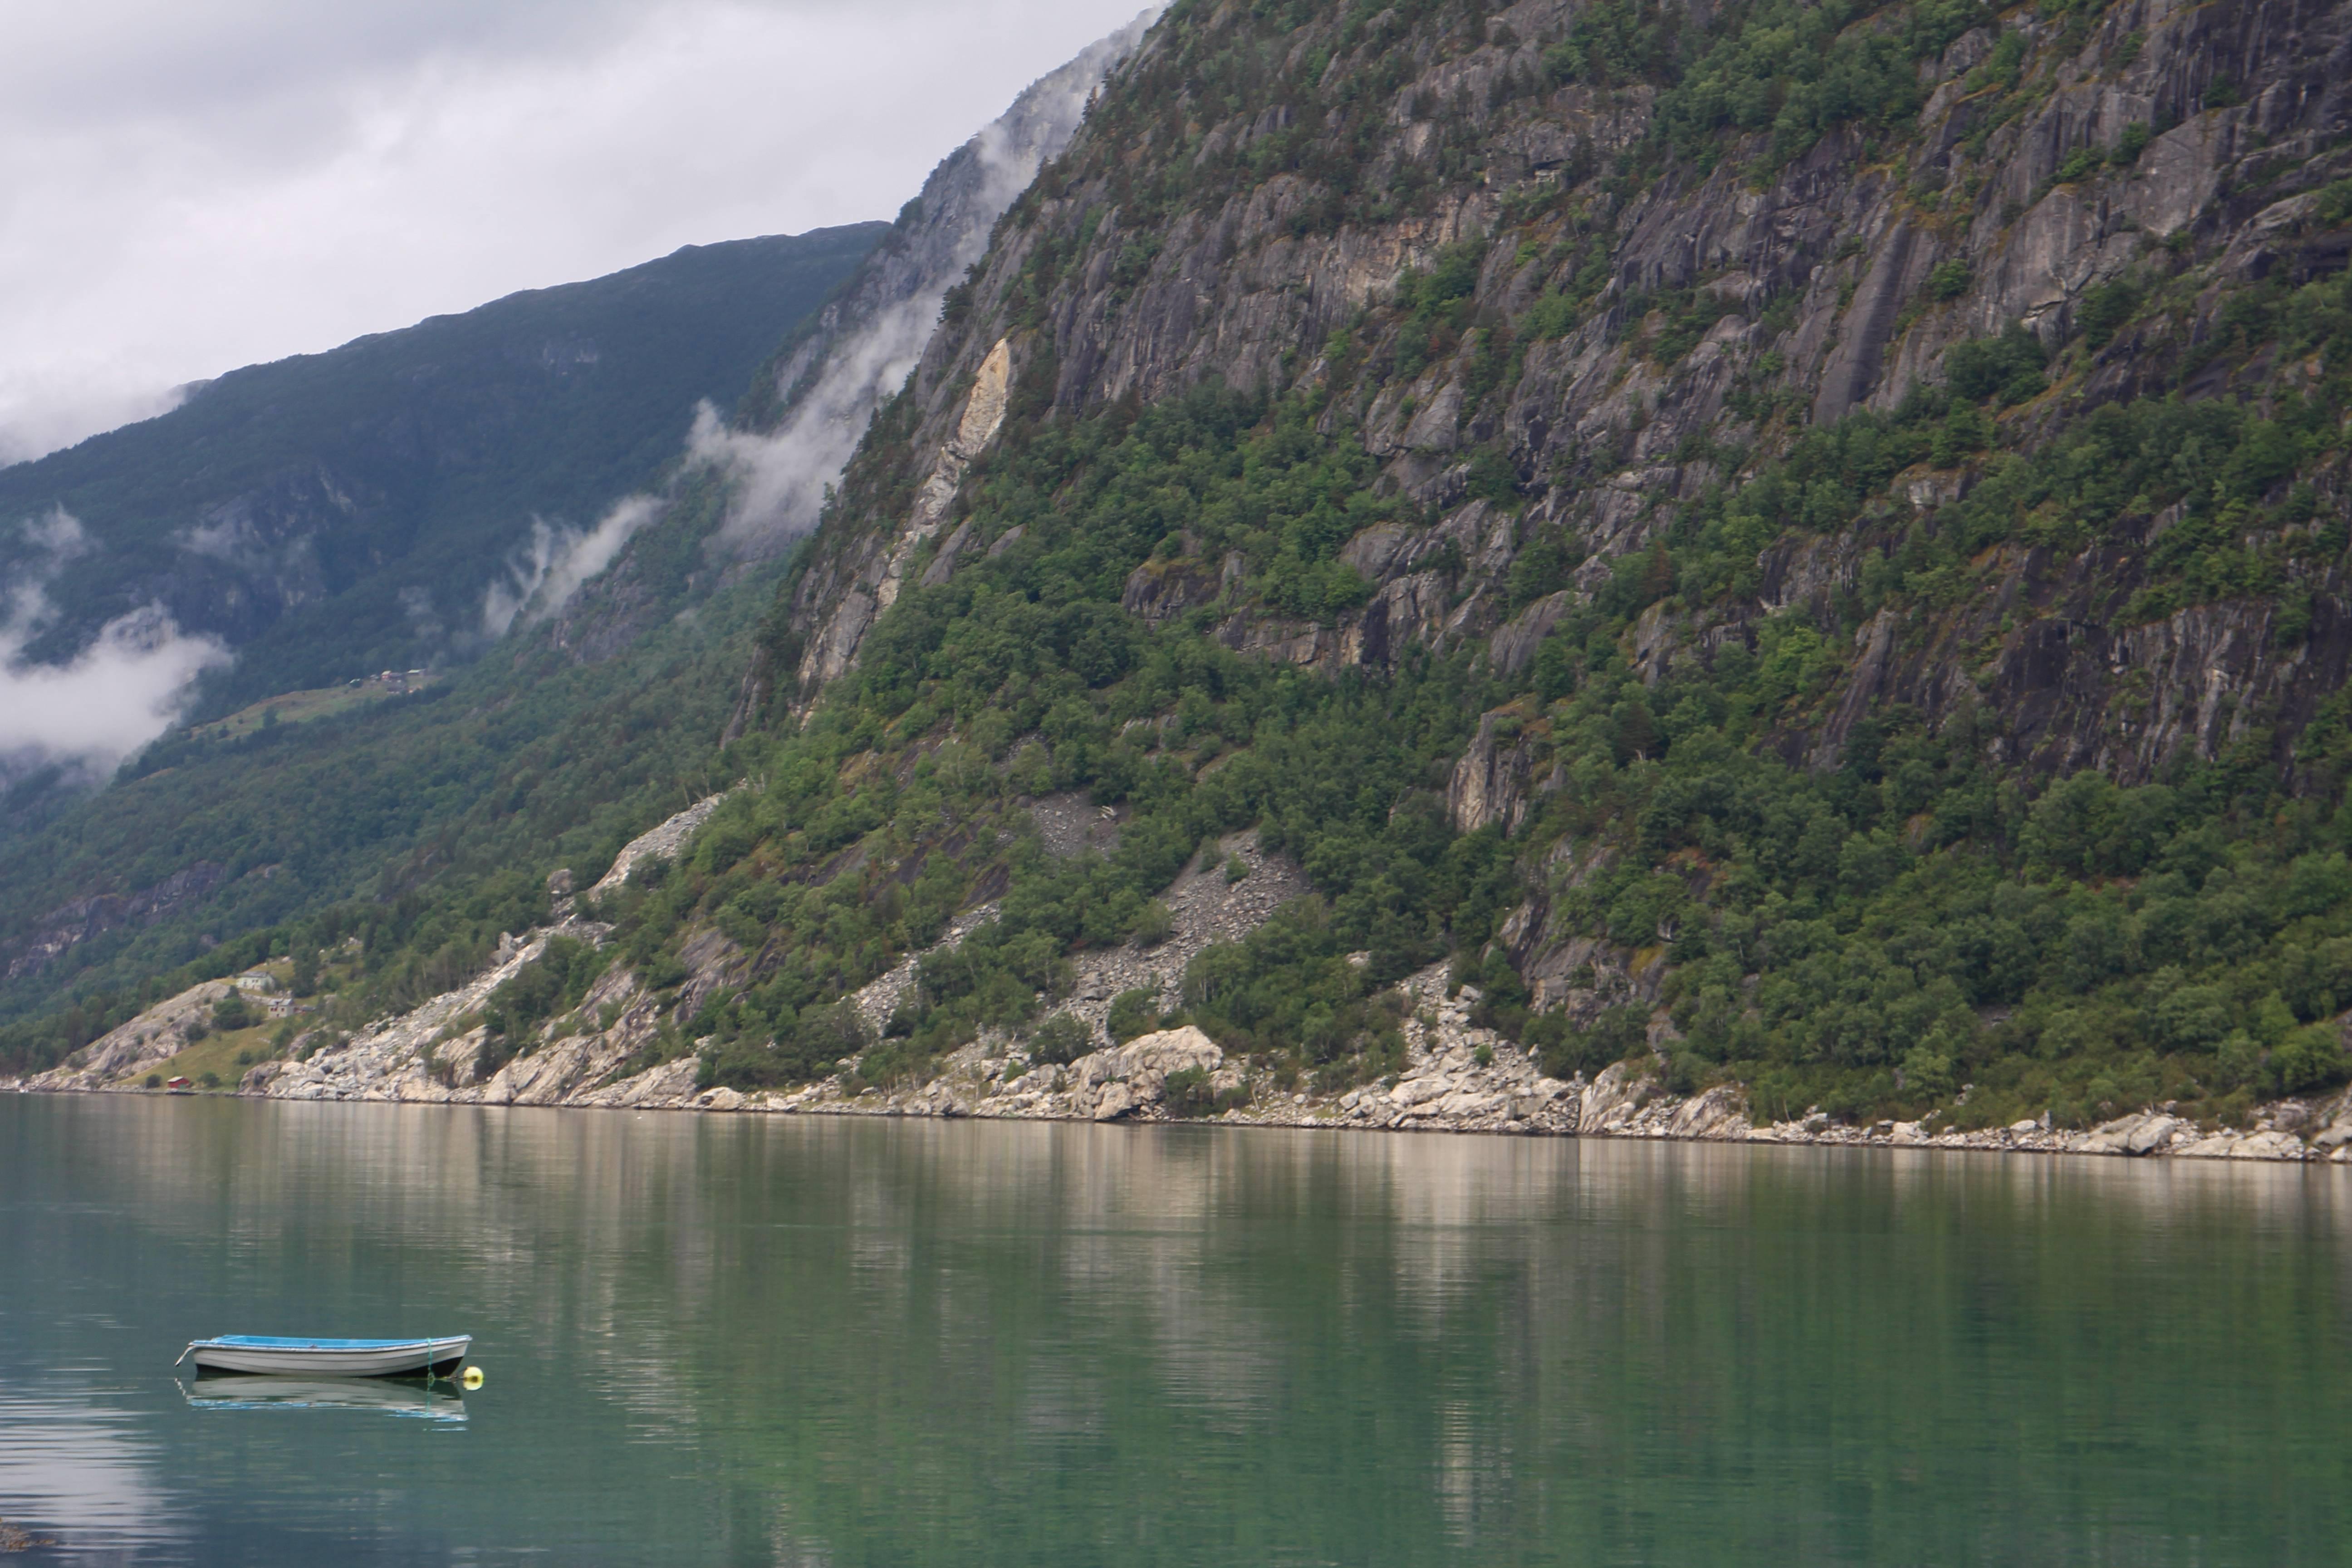 Photo 1: Escale à Eidfjord